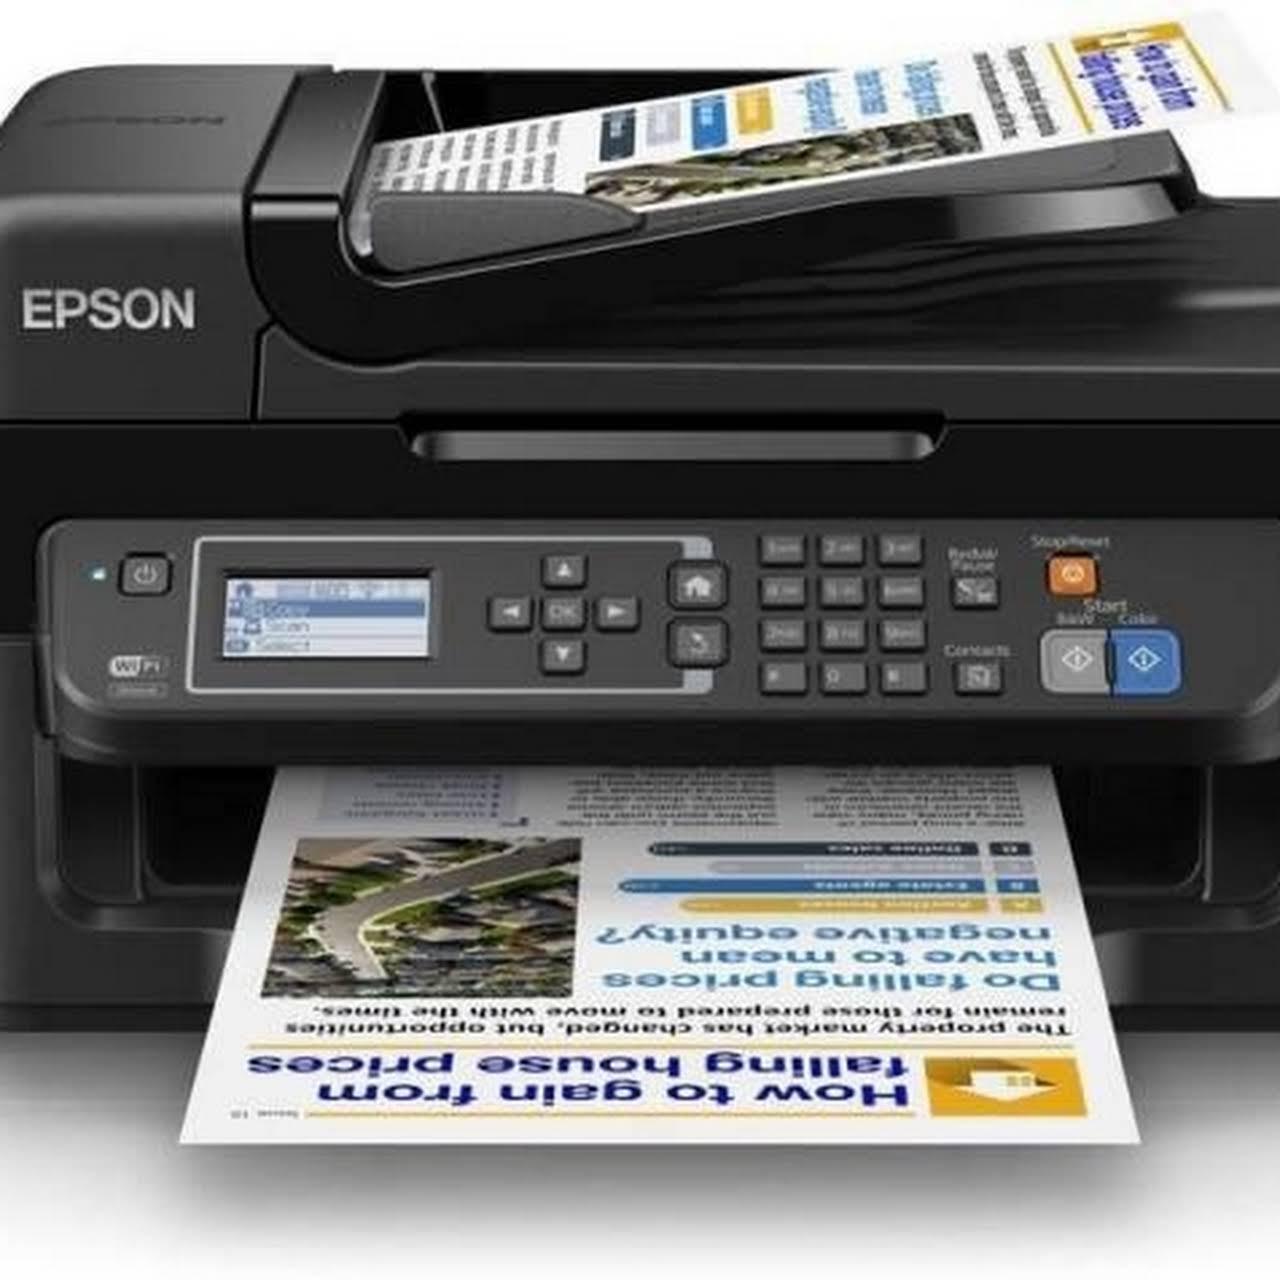 Printer Repairs Service Center - Electronics Repair Service in